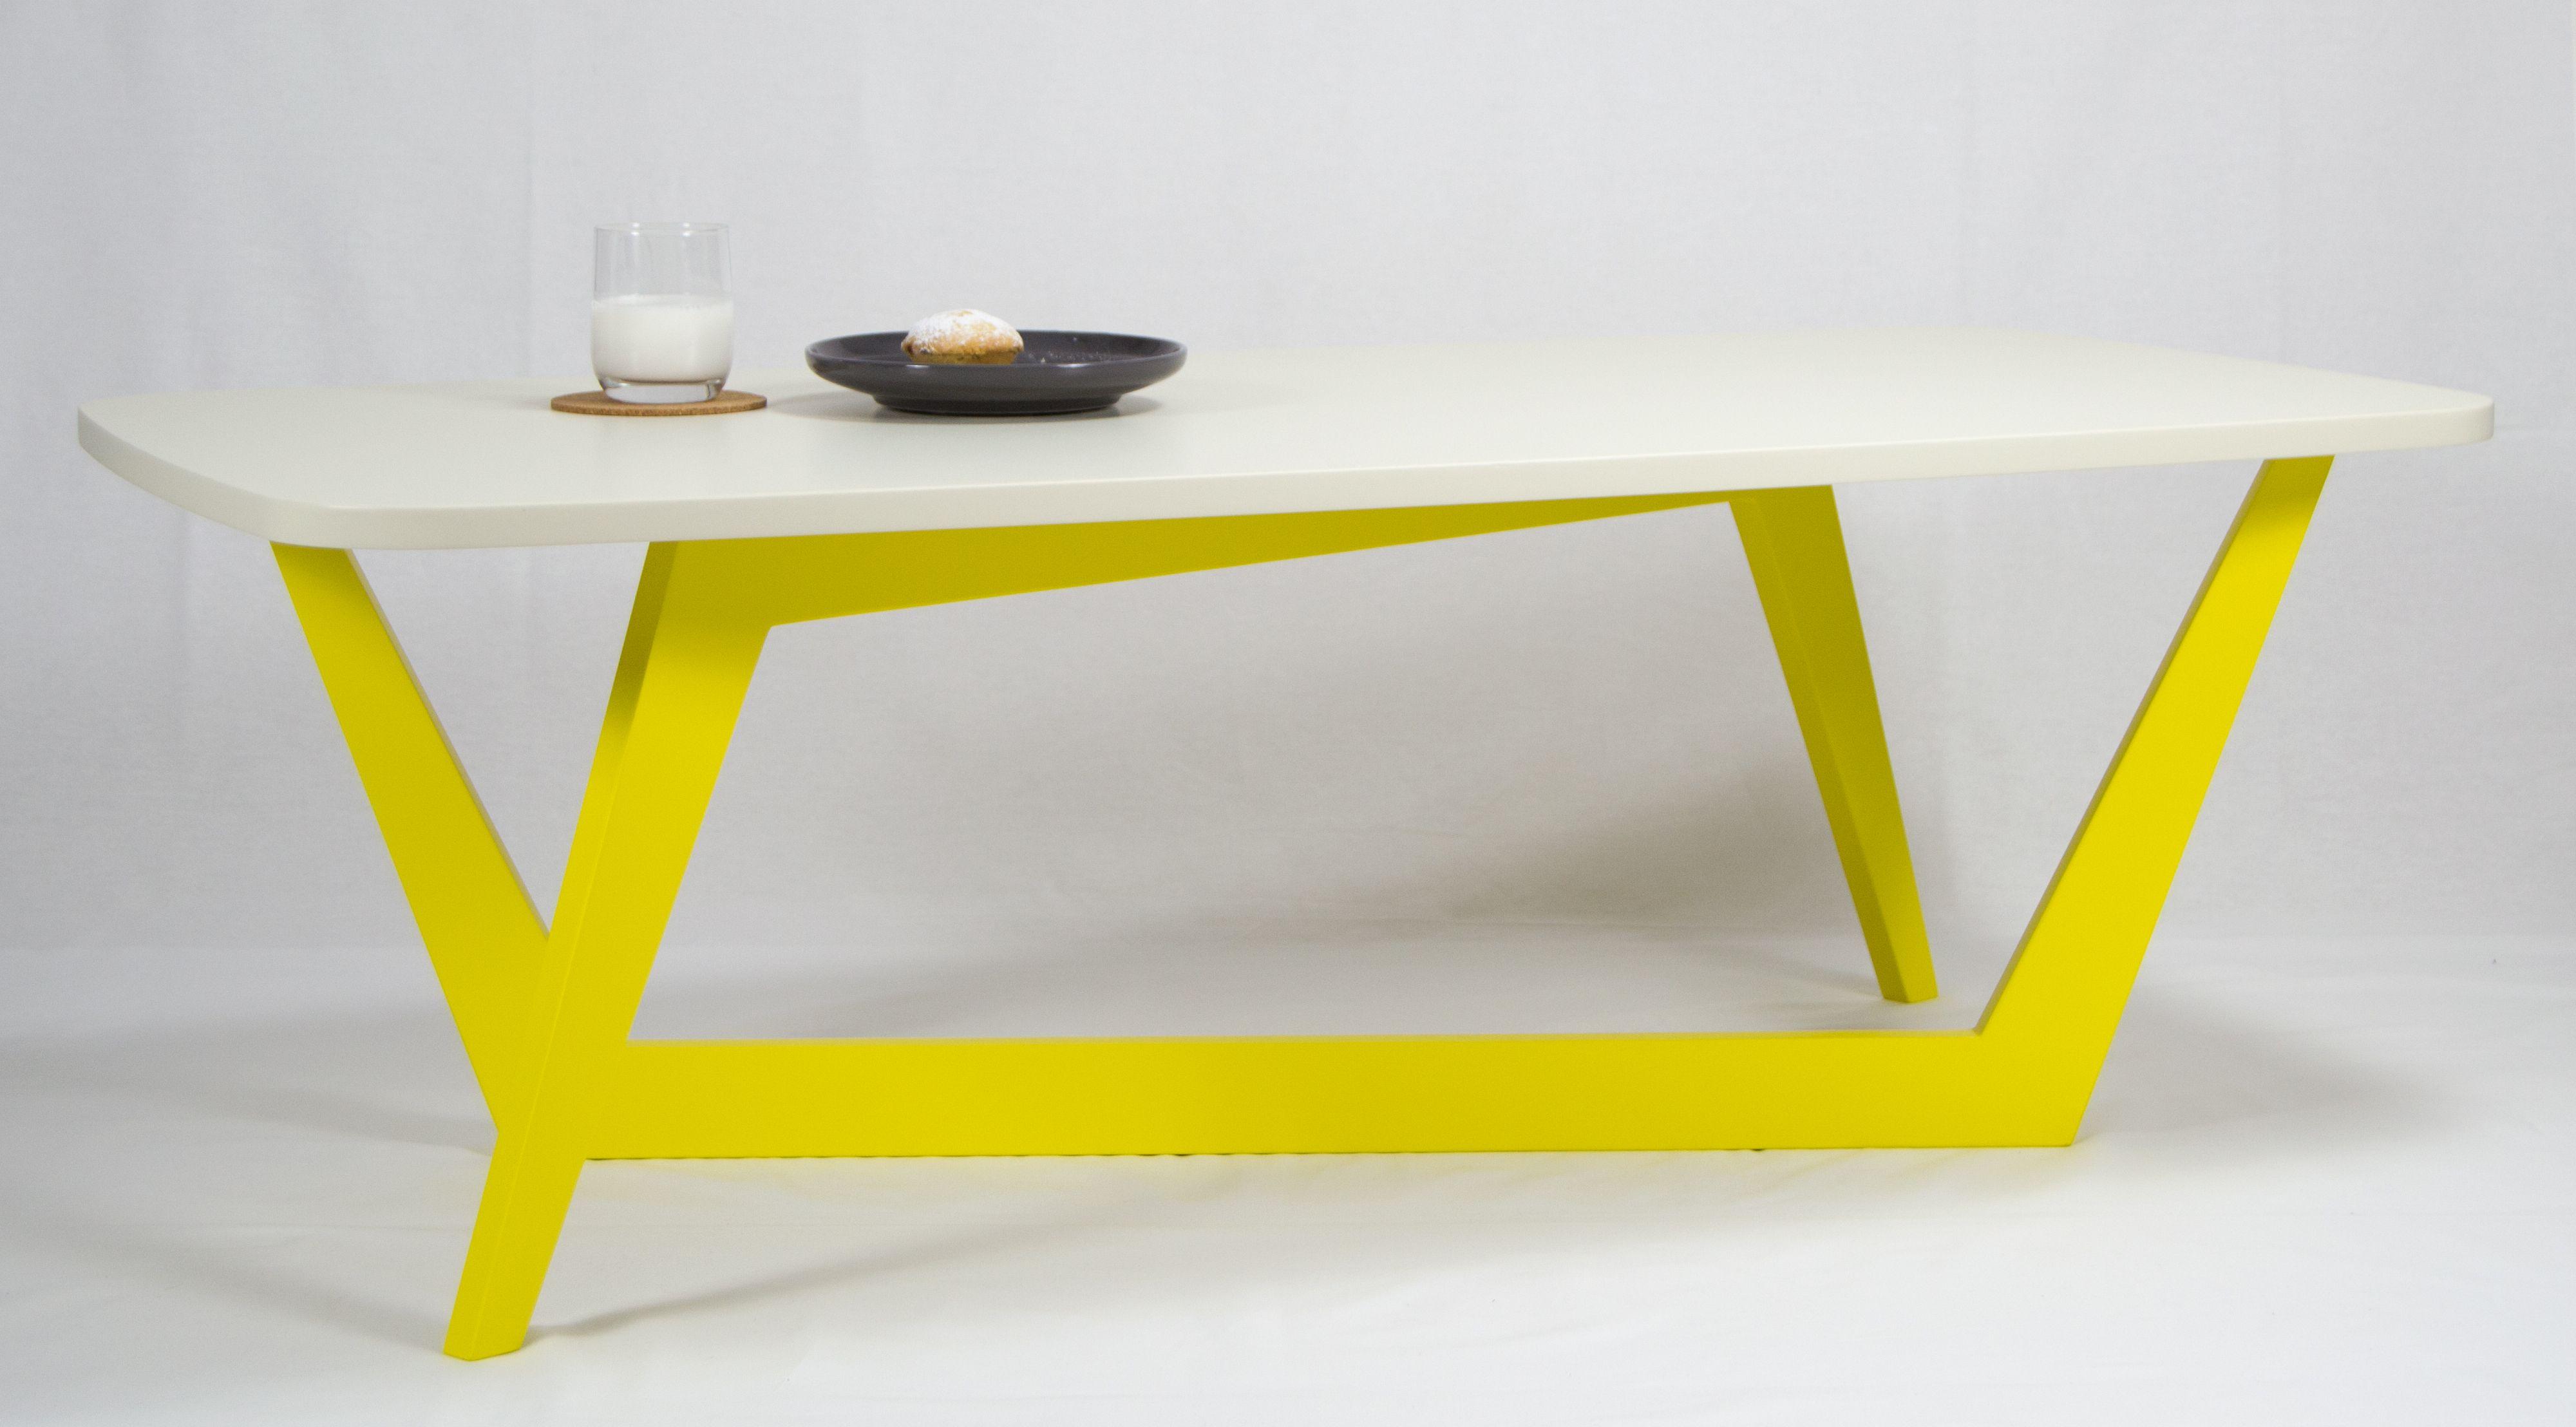 Viceversa coffee table Rectangular. Buy it on http://www.microstudiodesign.it/shop/negozio/negozio/tavolini/tavolini-viceversa/